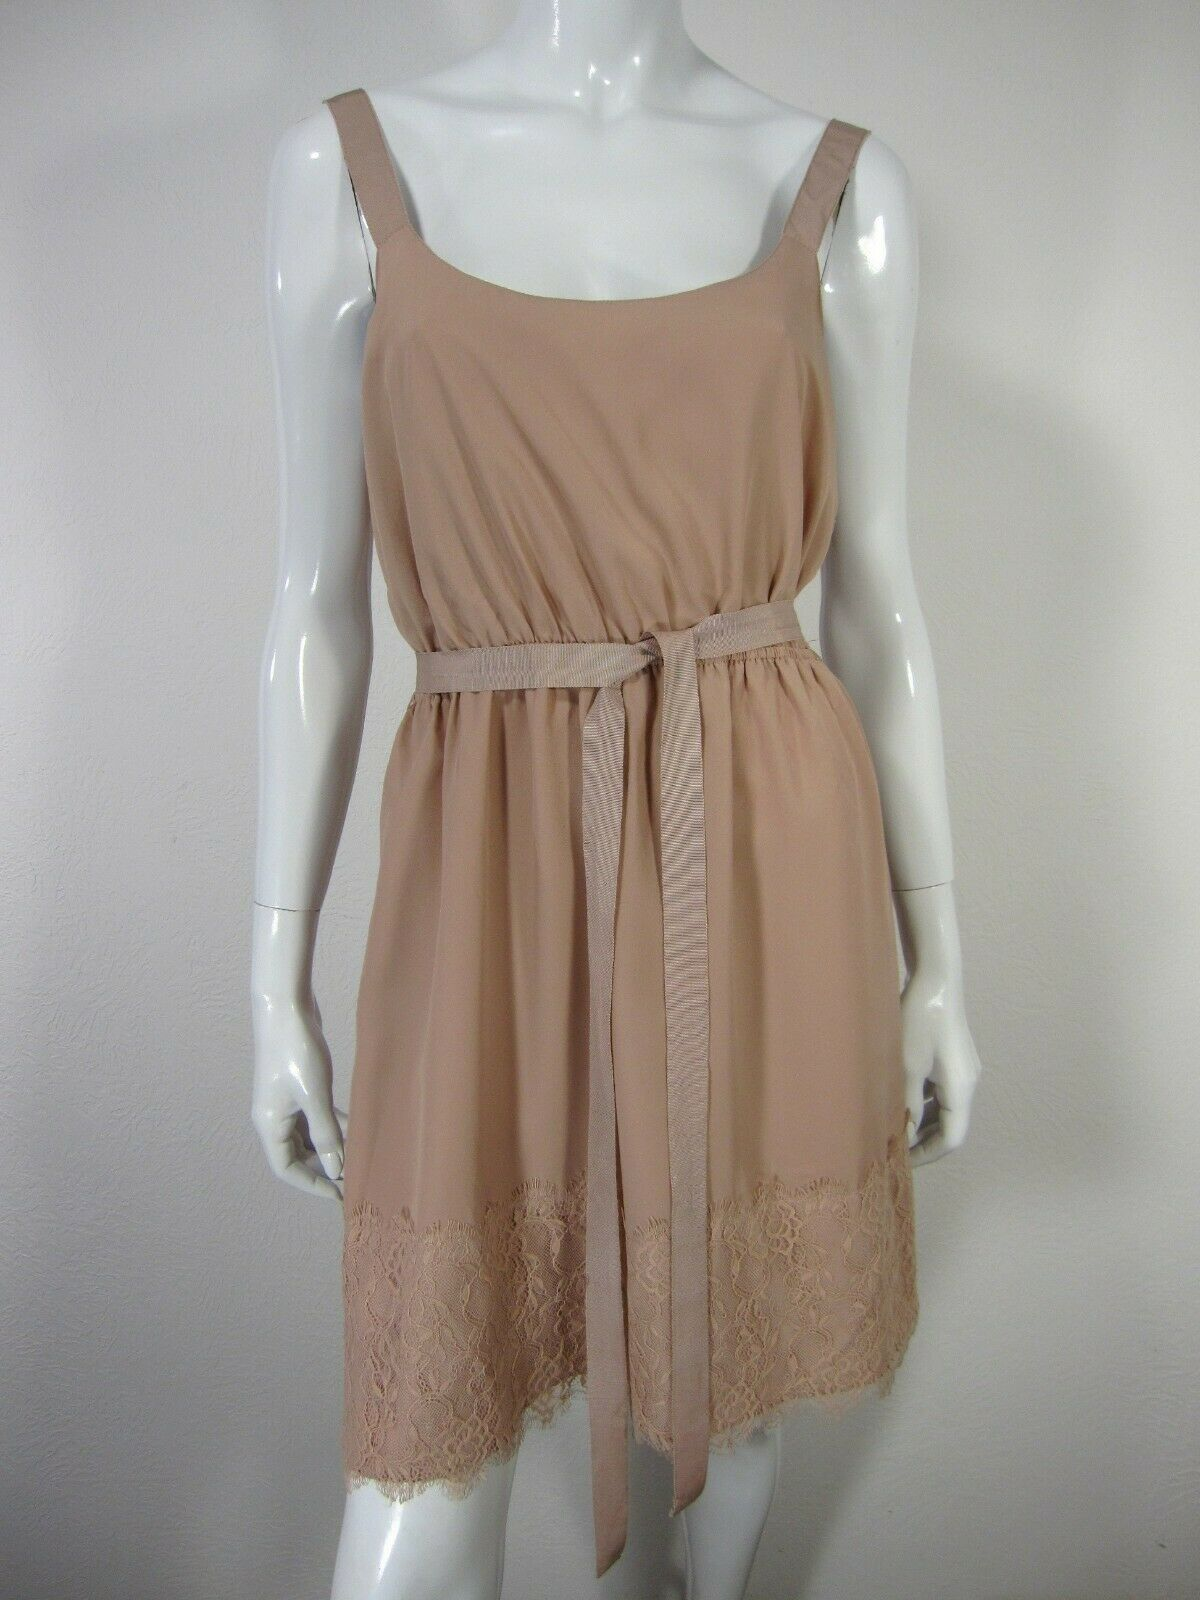 Rhapsody Scoop Neckline Sleeveless Dress L Large Cream Beige Belt